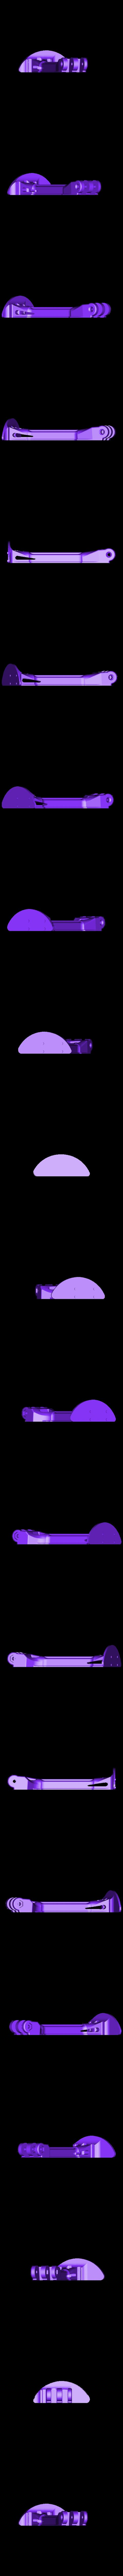 ant support (1pcs).STL Download STL file Folding Quadcopter 450 Frame • 3D print object, AleksandrDolzhenko